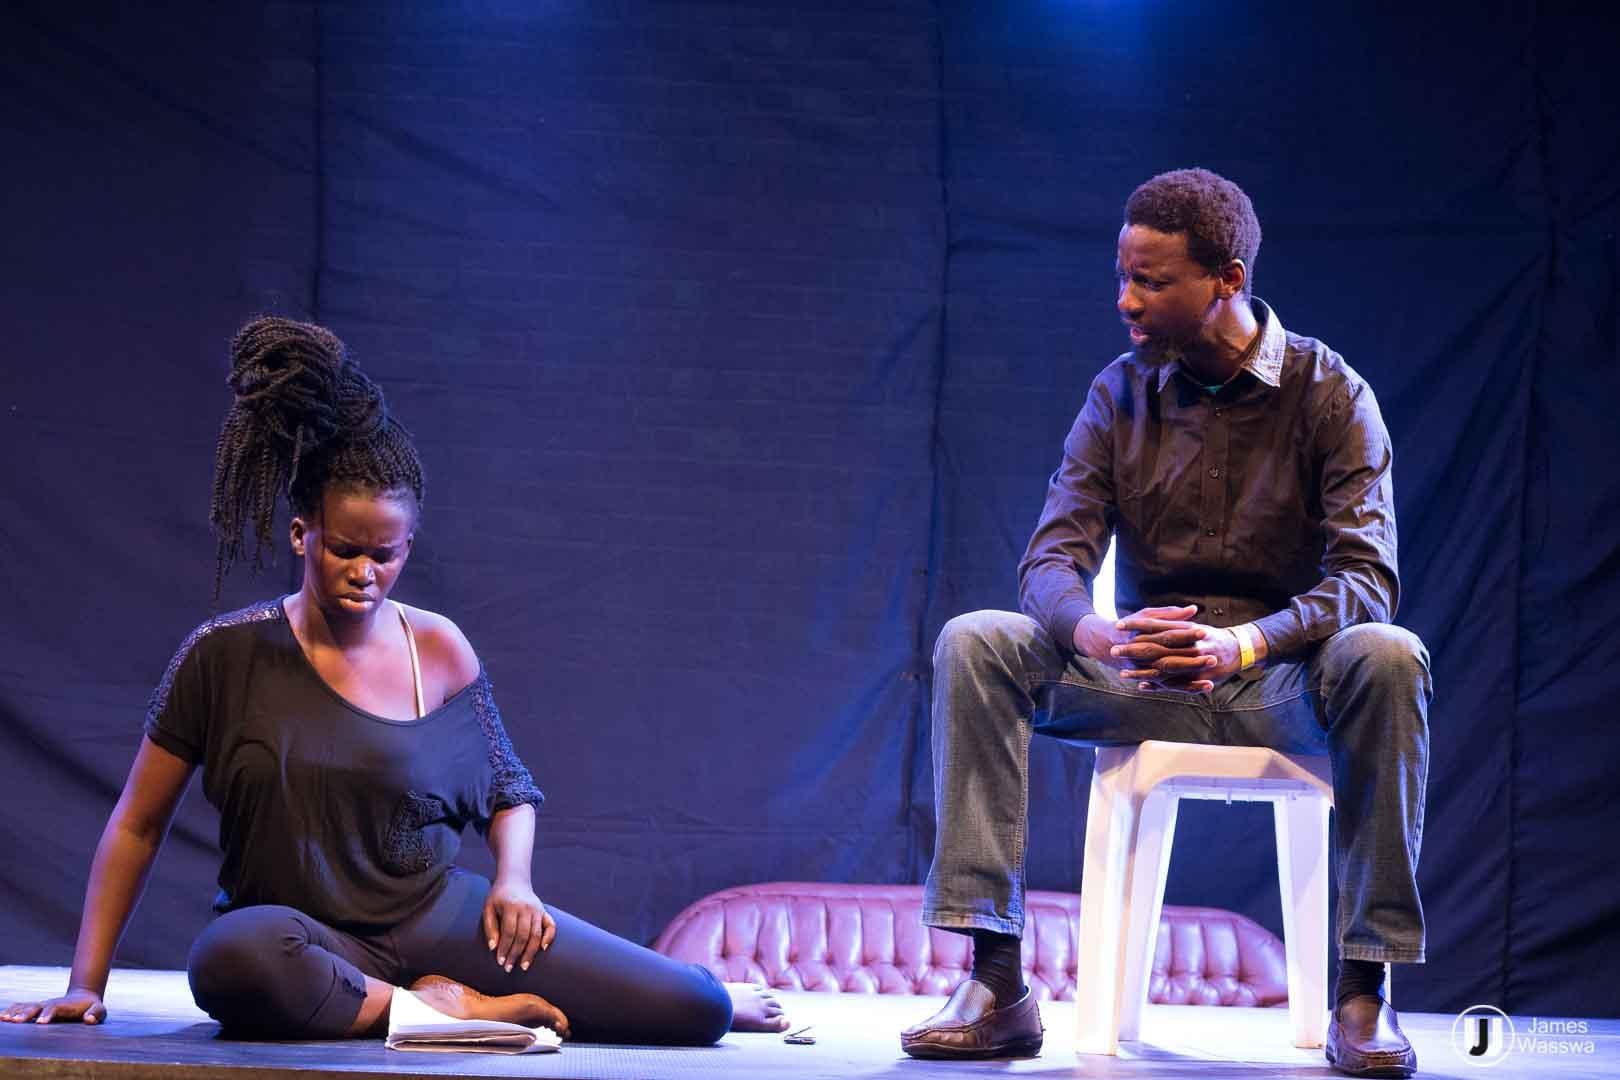 Lloyd Lutara's A Ghost Story directed by Angella Emurwon in 2018